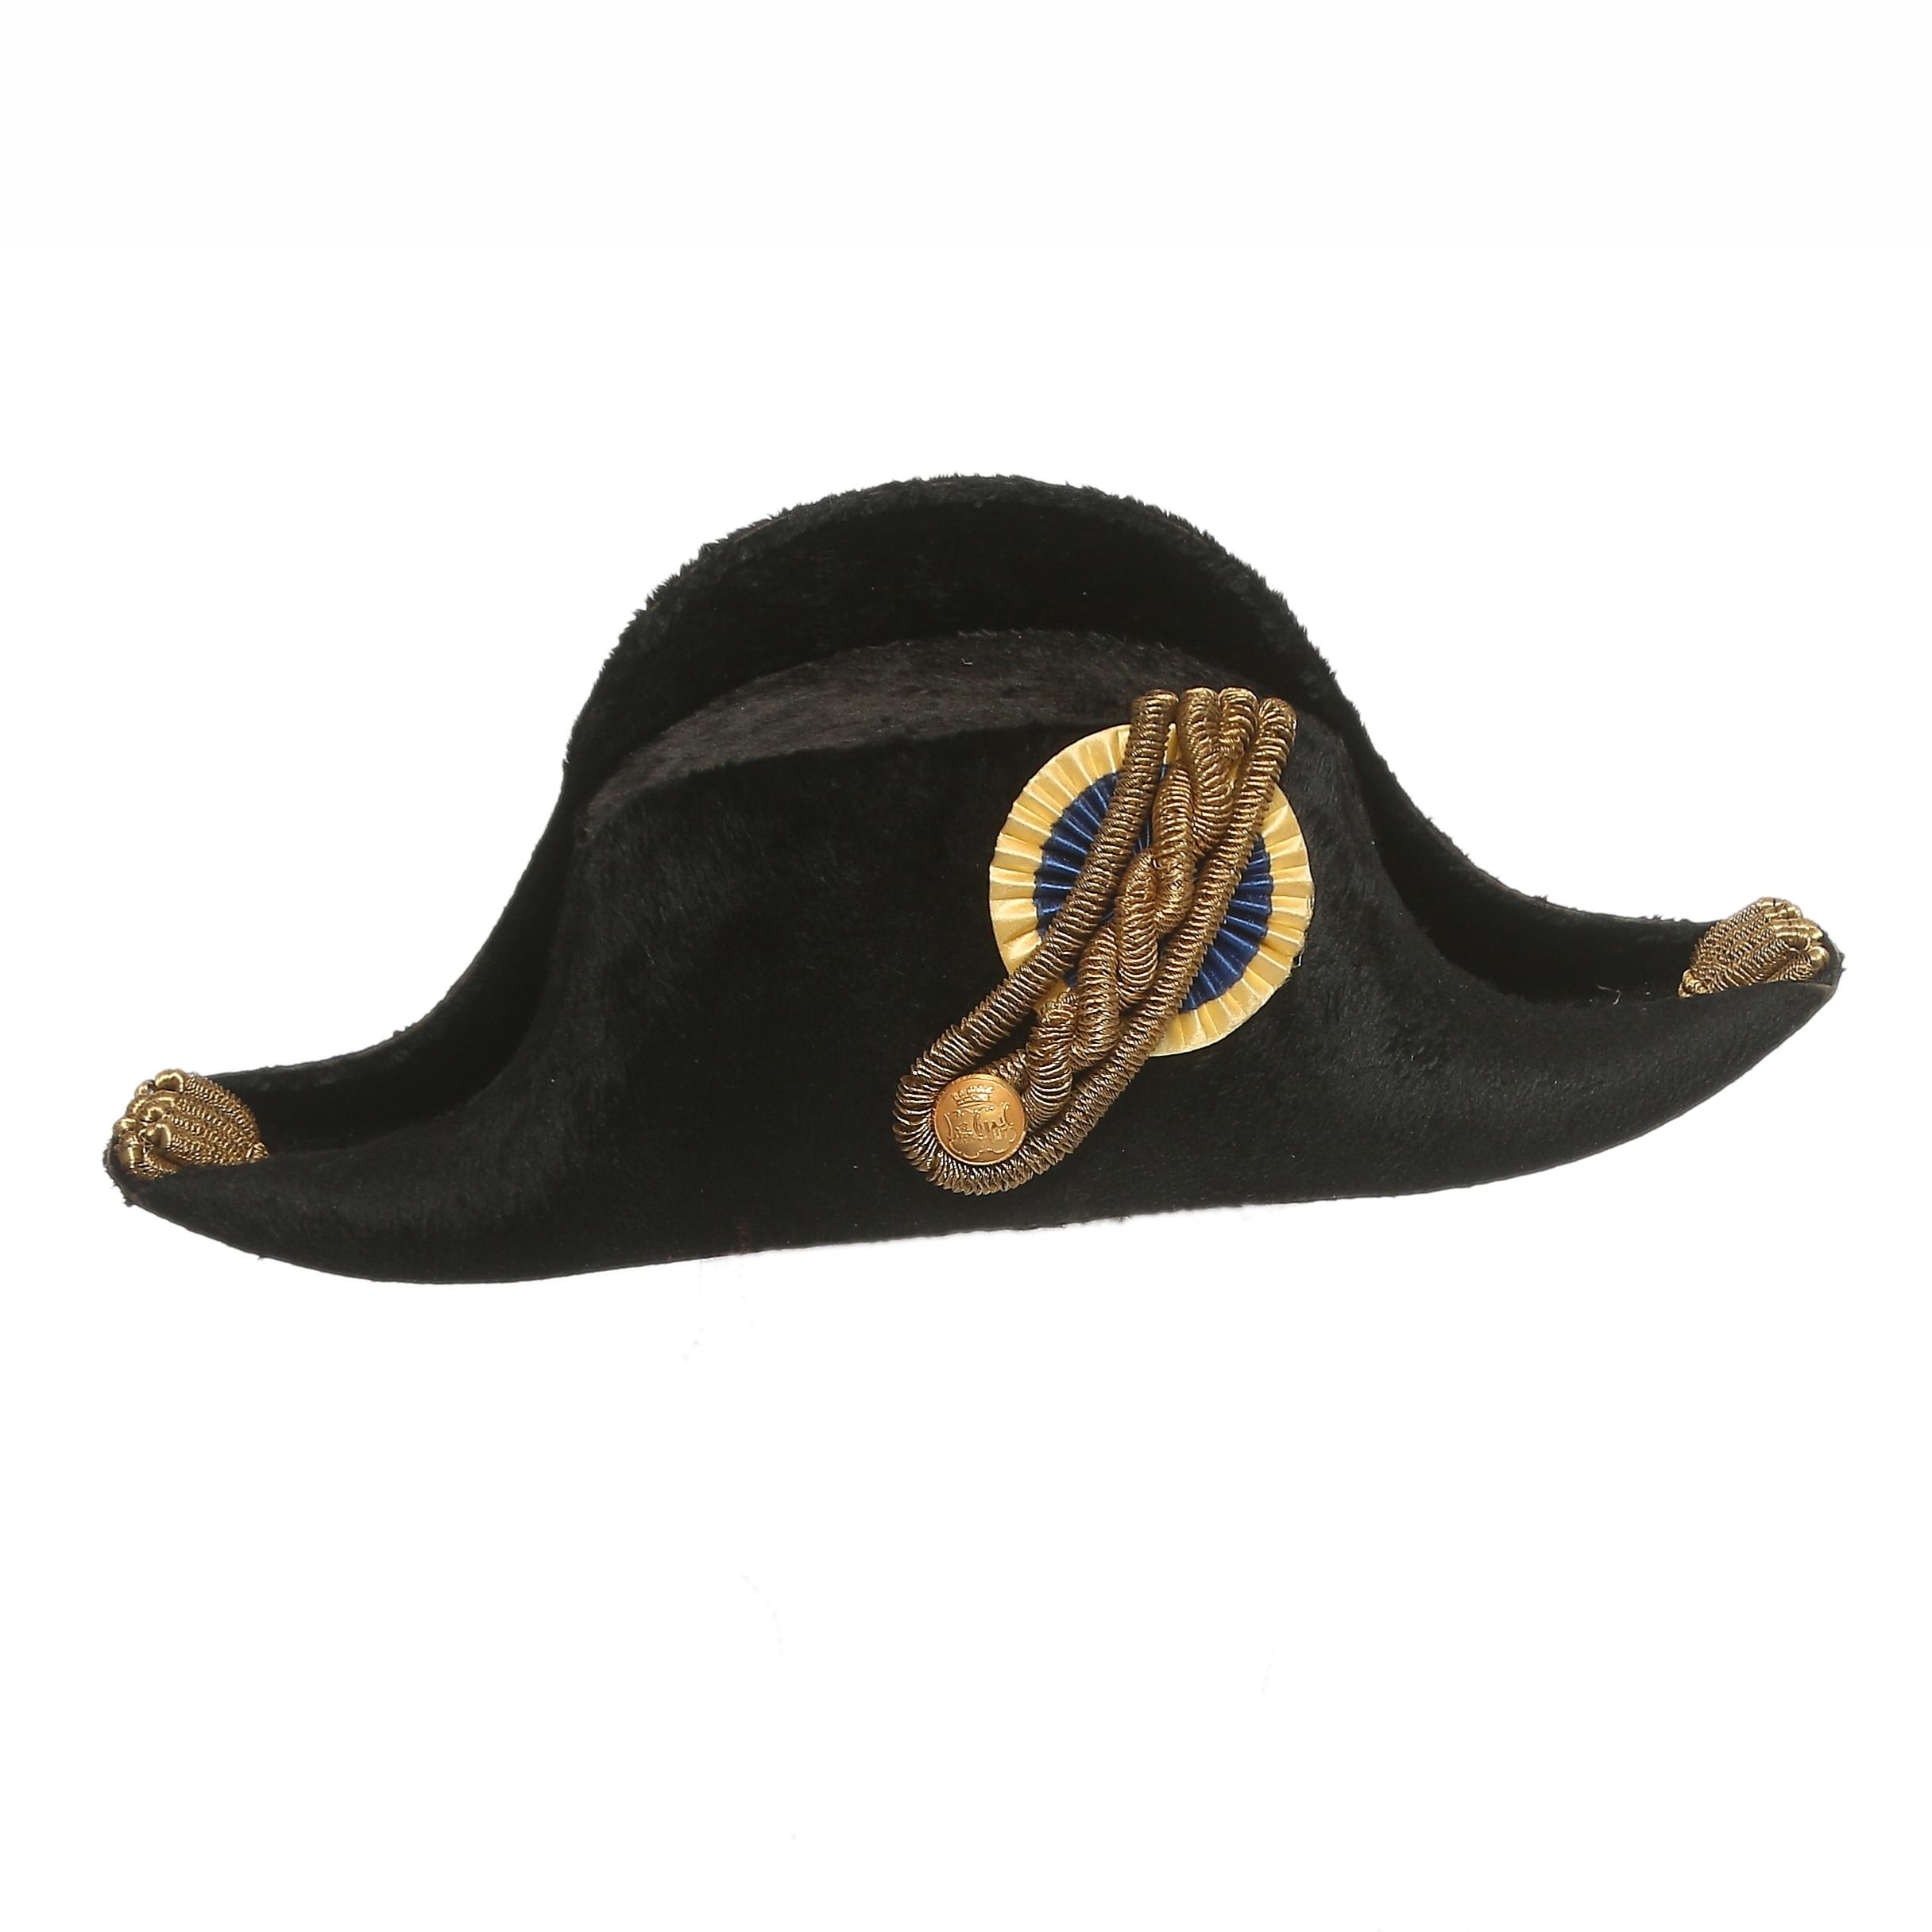 Images for 599283 BICORNE, med hattask i trä, Ericsson& Co Stockholm, 1800 tal Auctionet